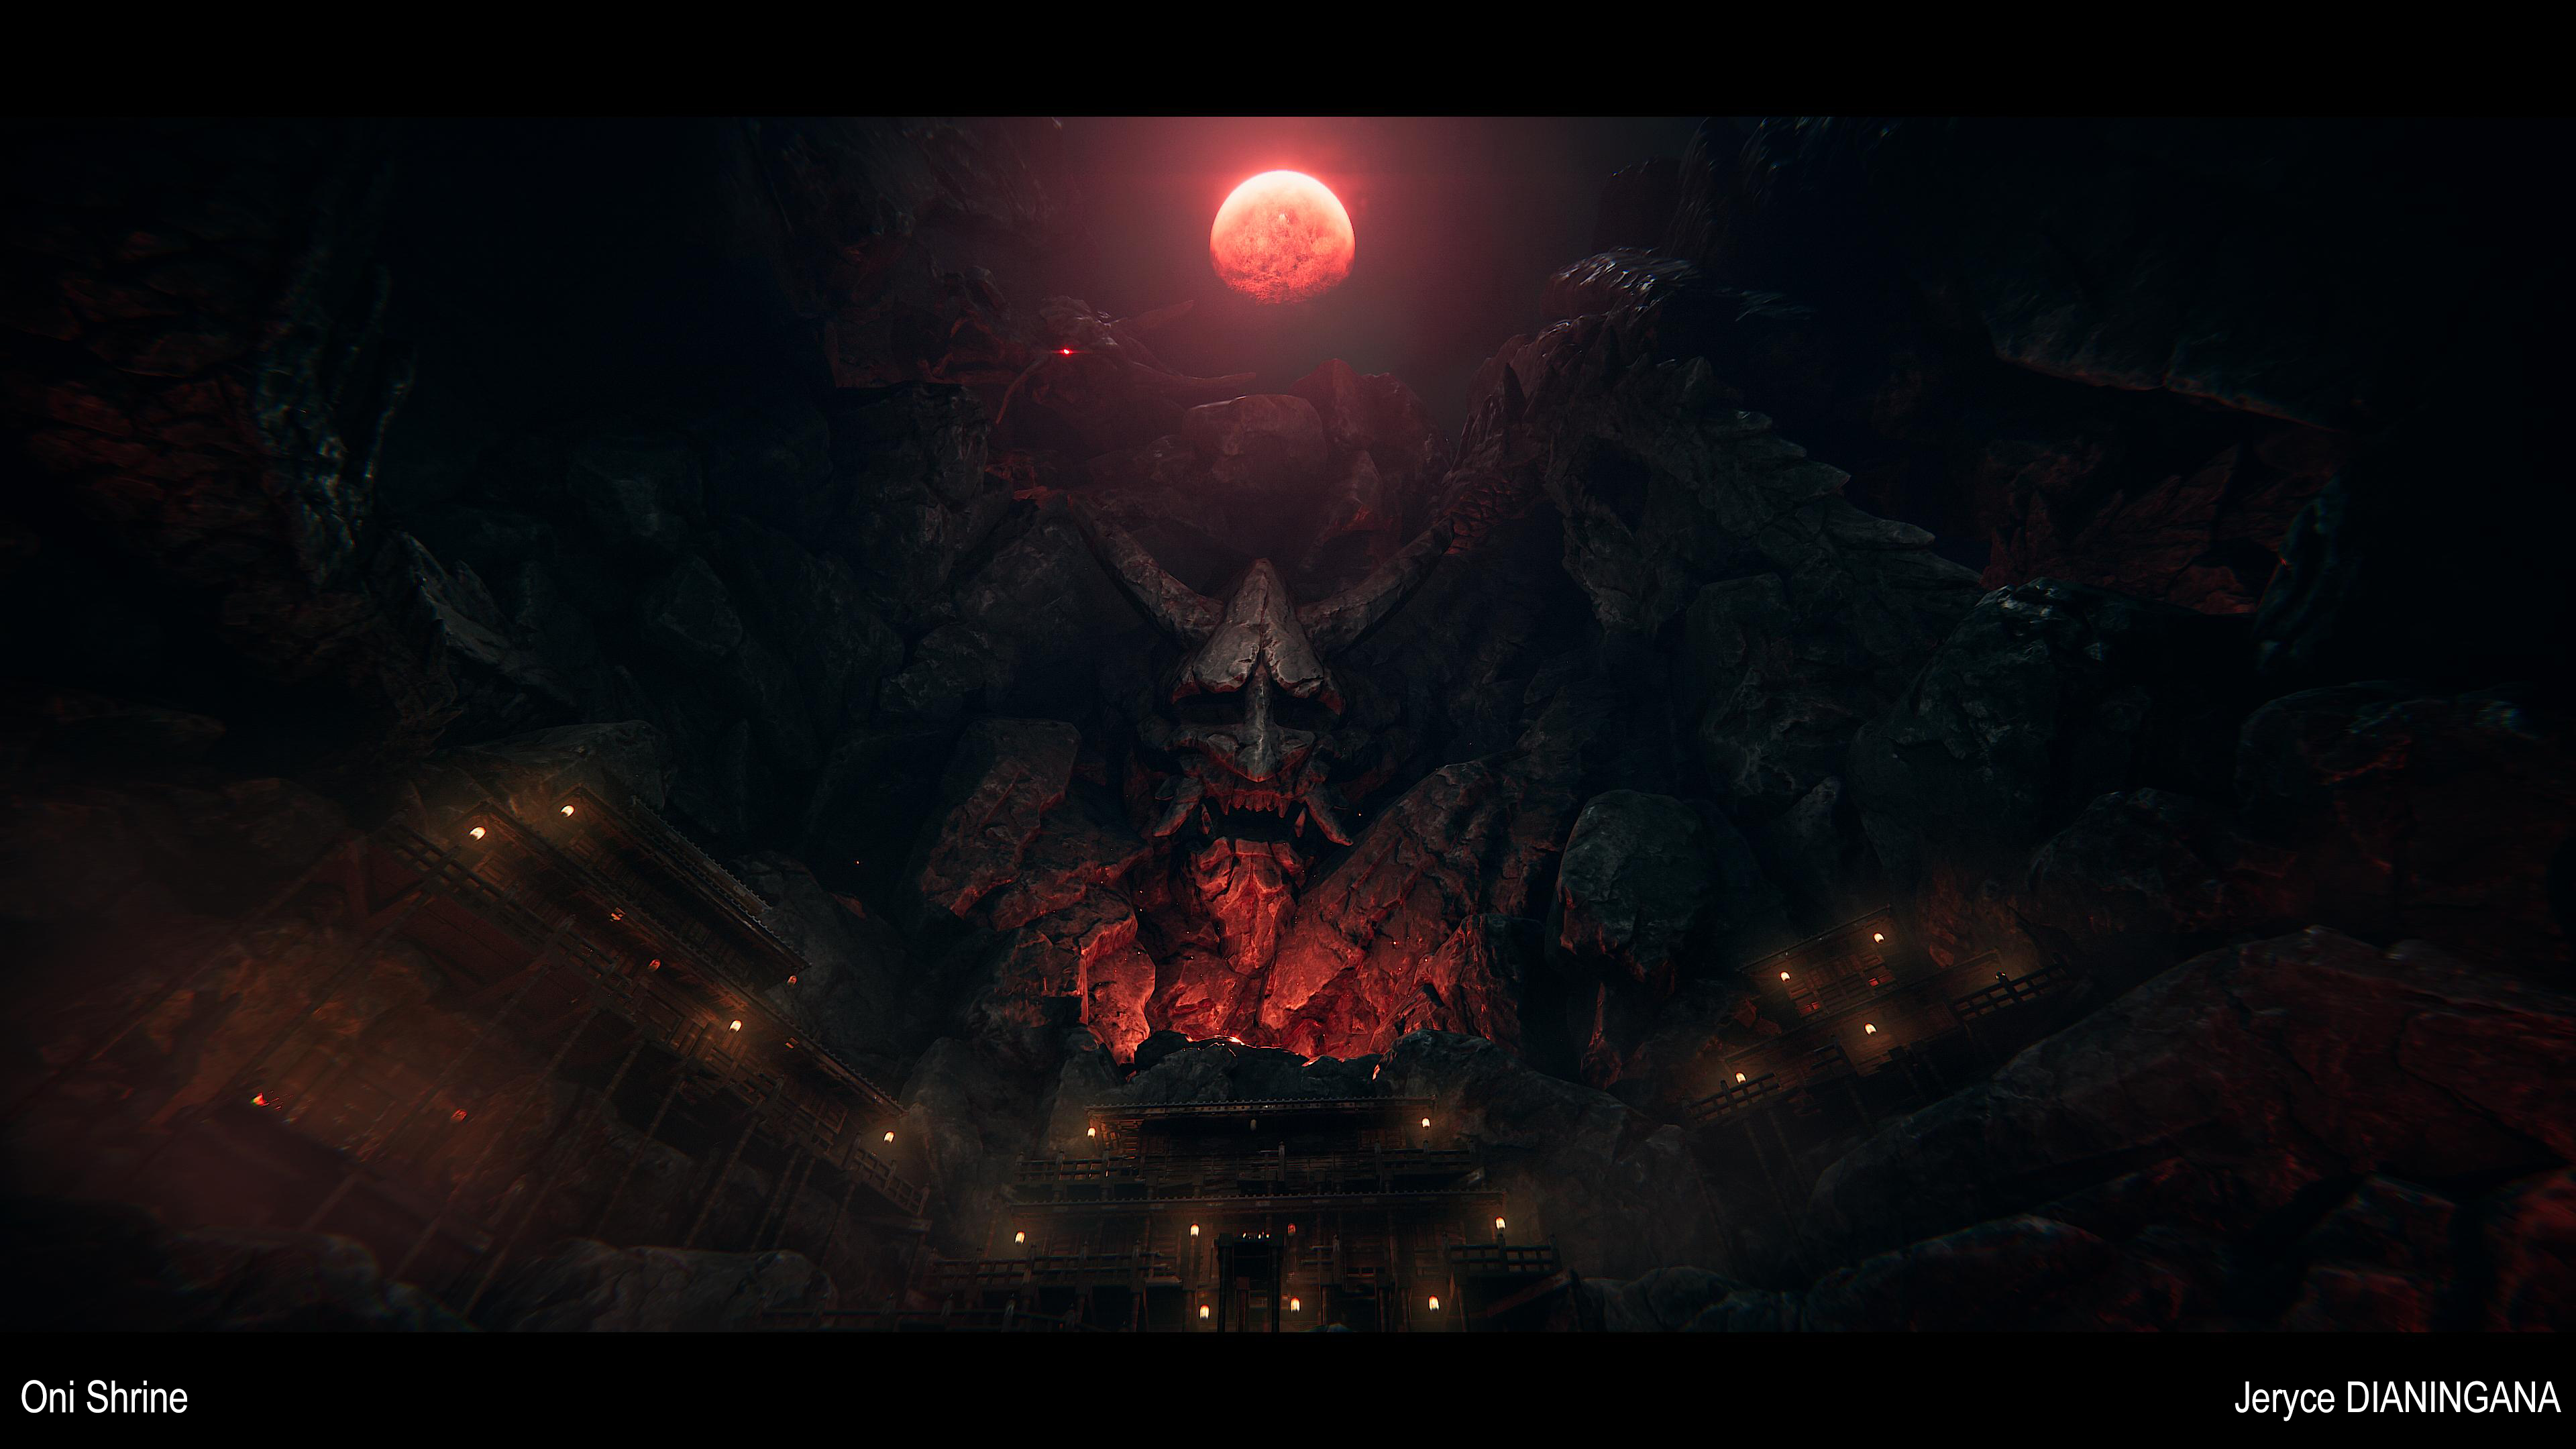 Oni Shrine